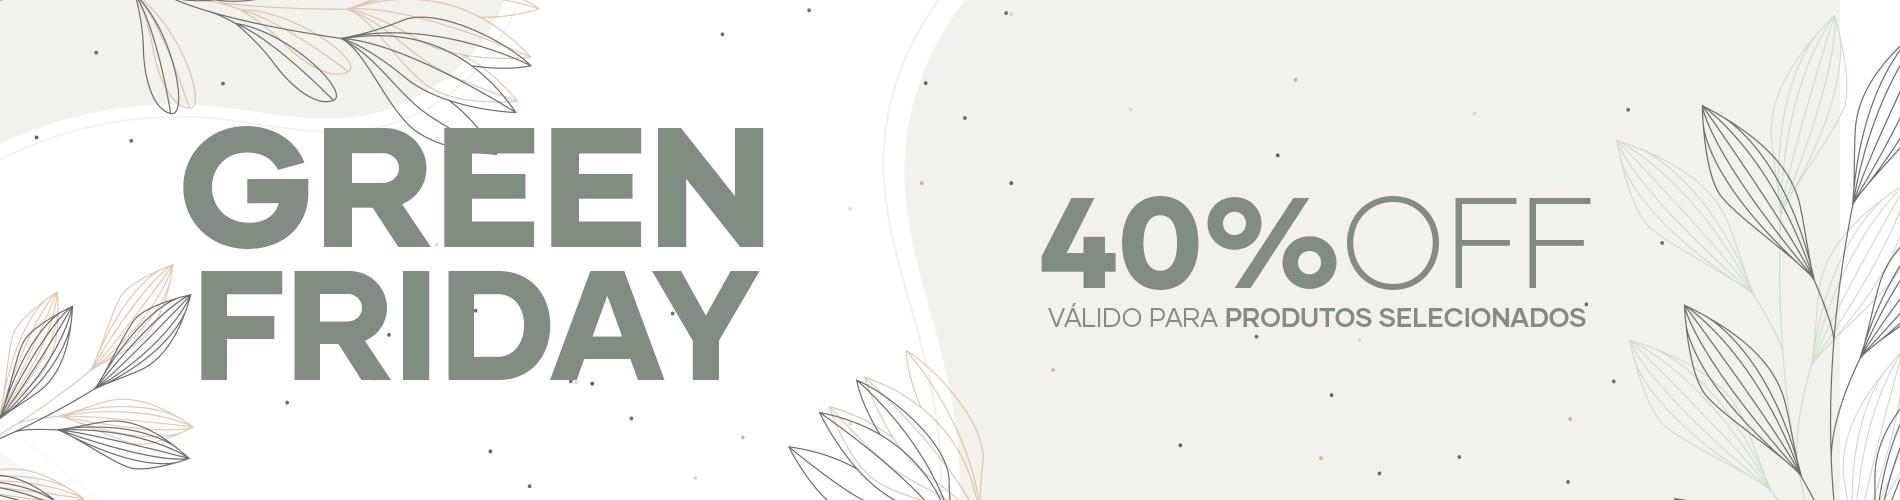 Green Friday 2020